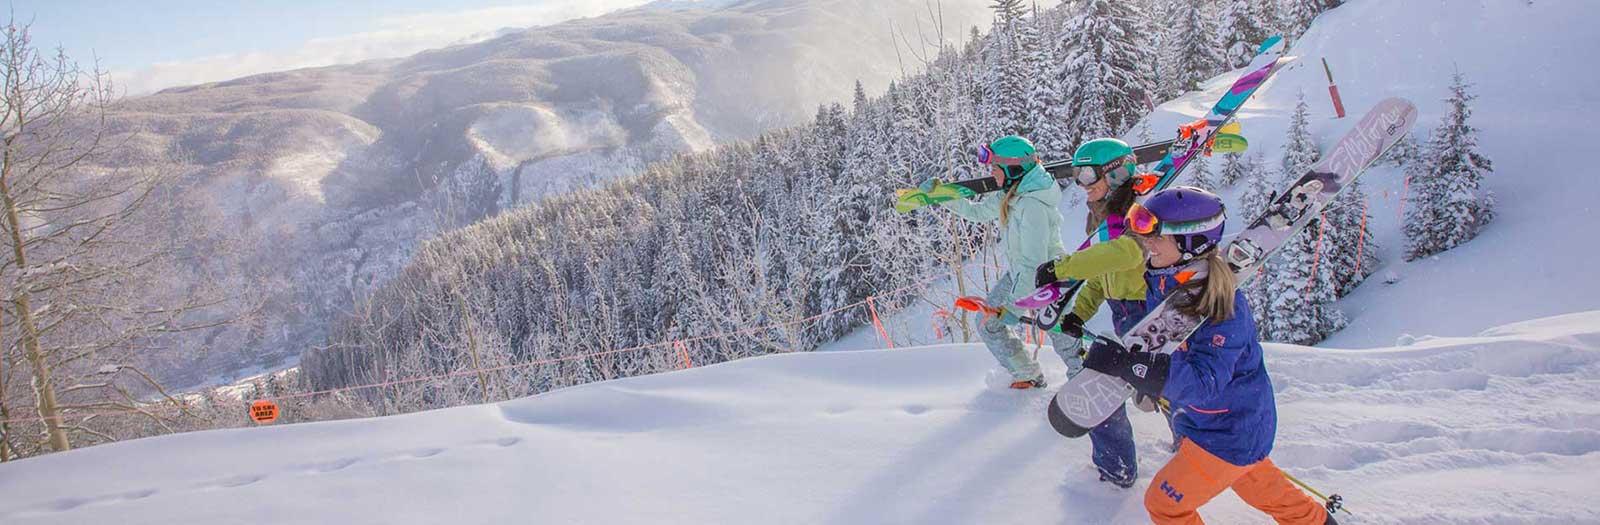 beginner ski vacations, deals on beginner skiing at top ski resorts